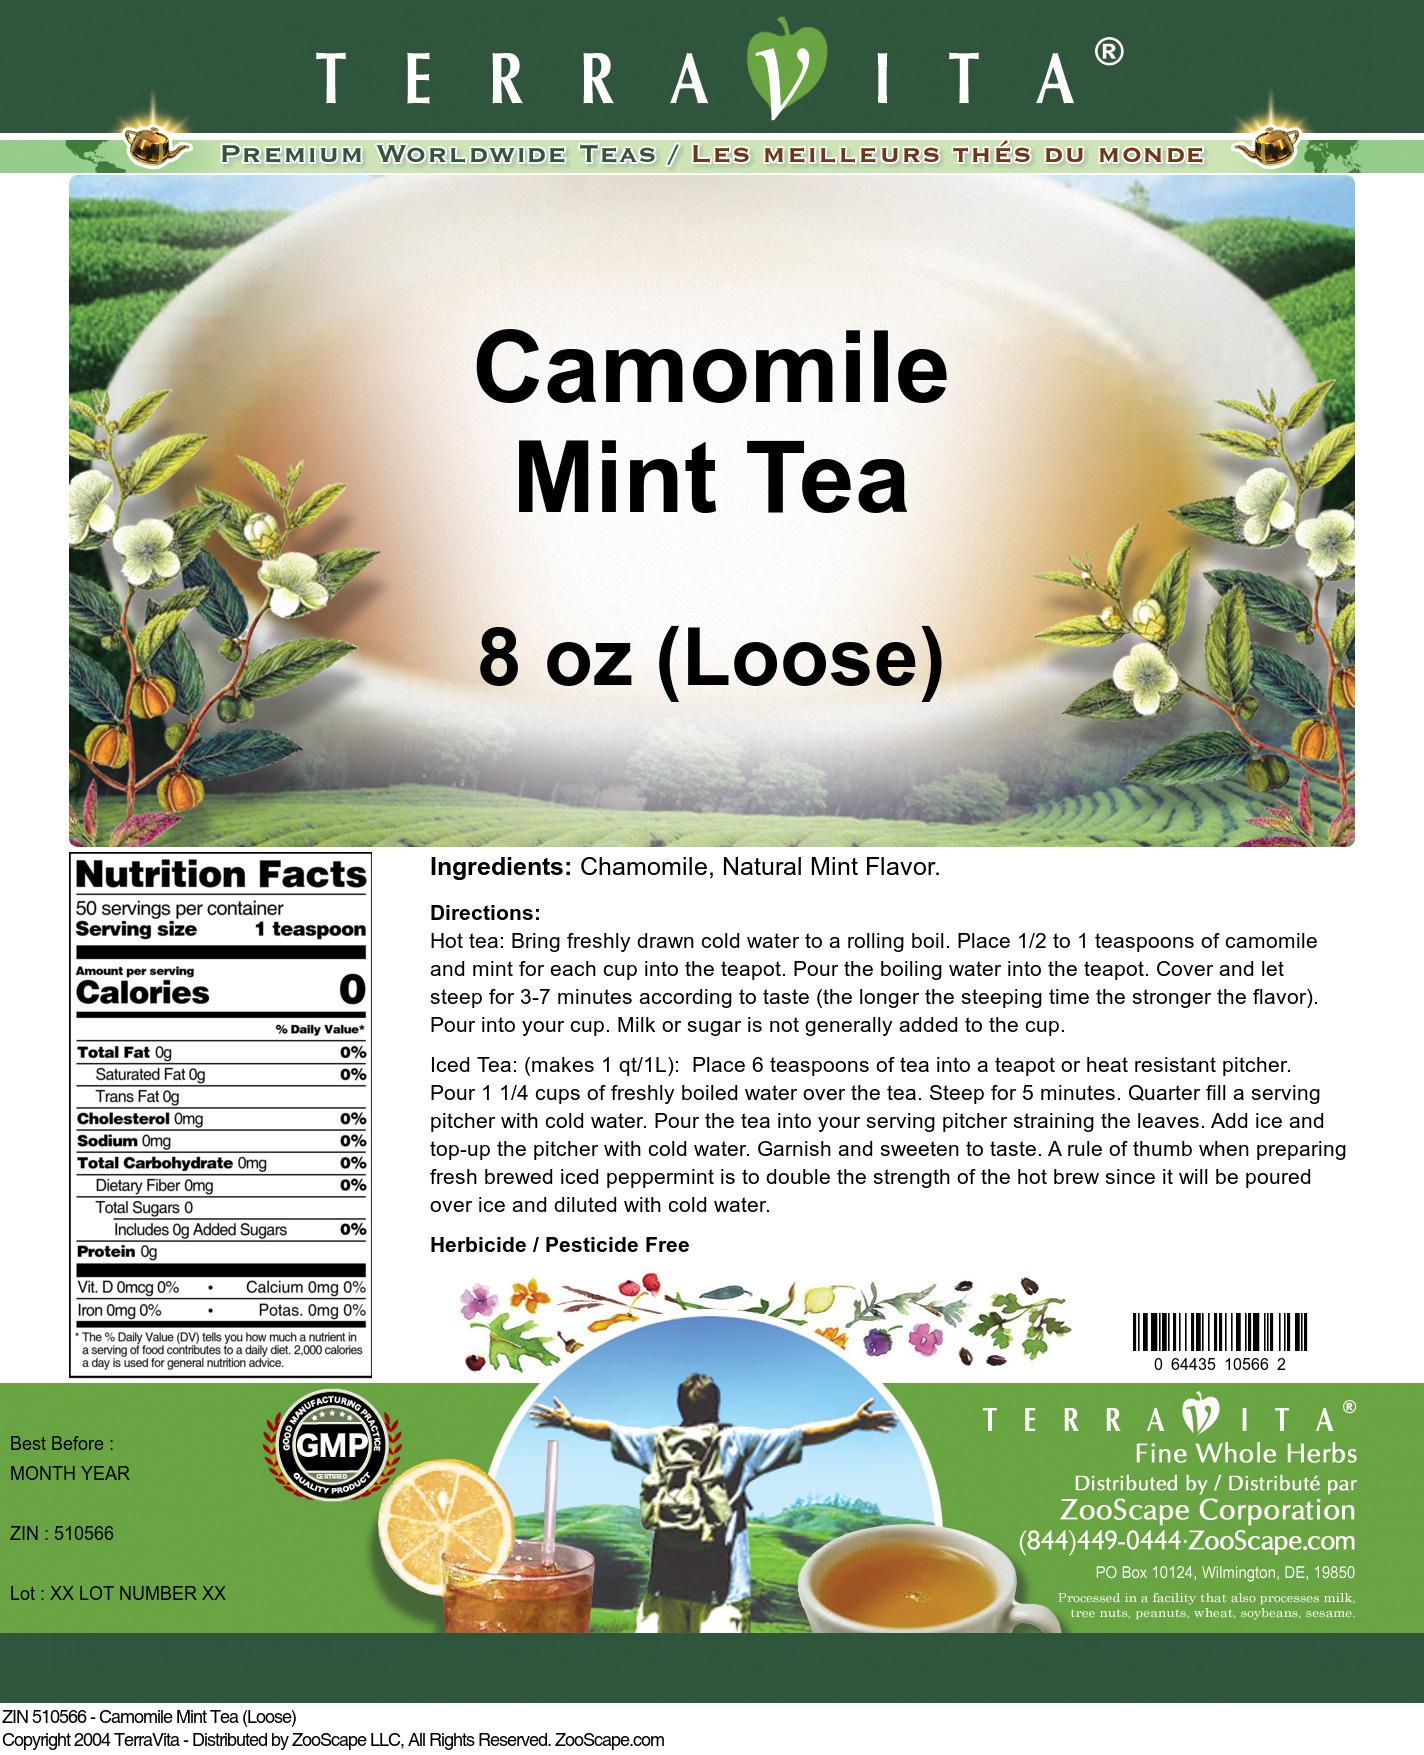 Camomile Mint